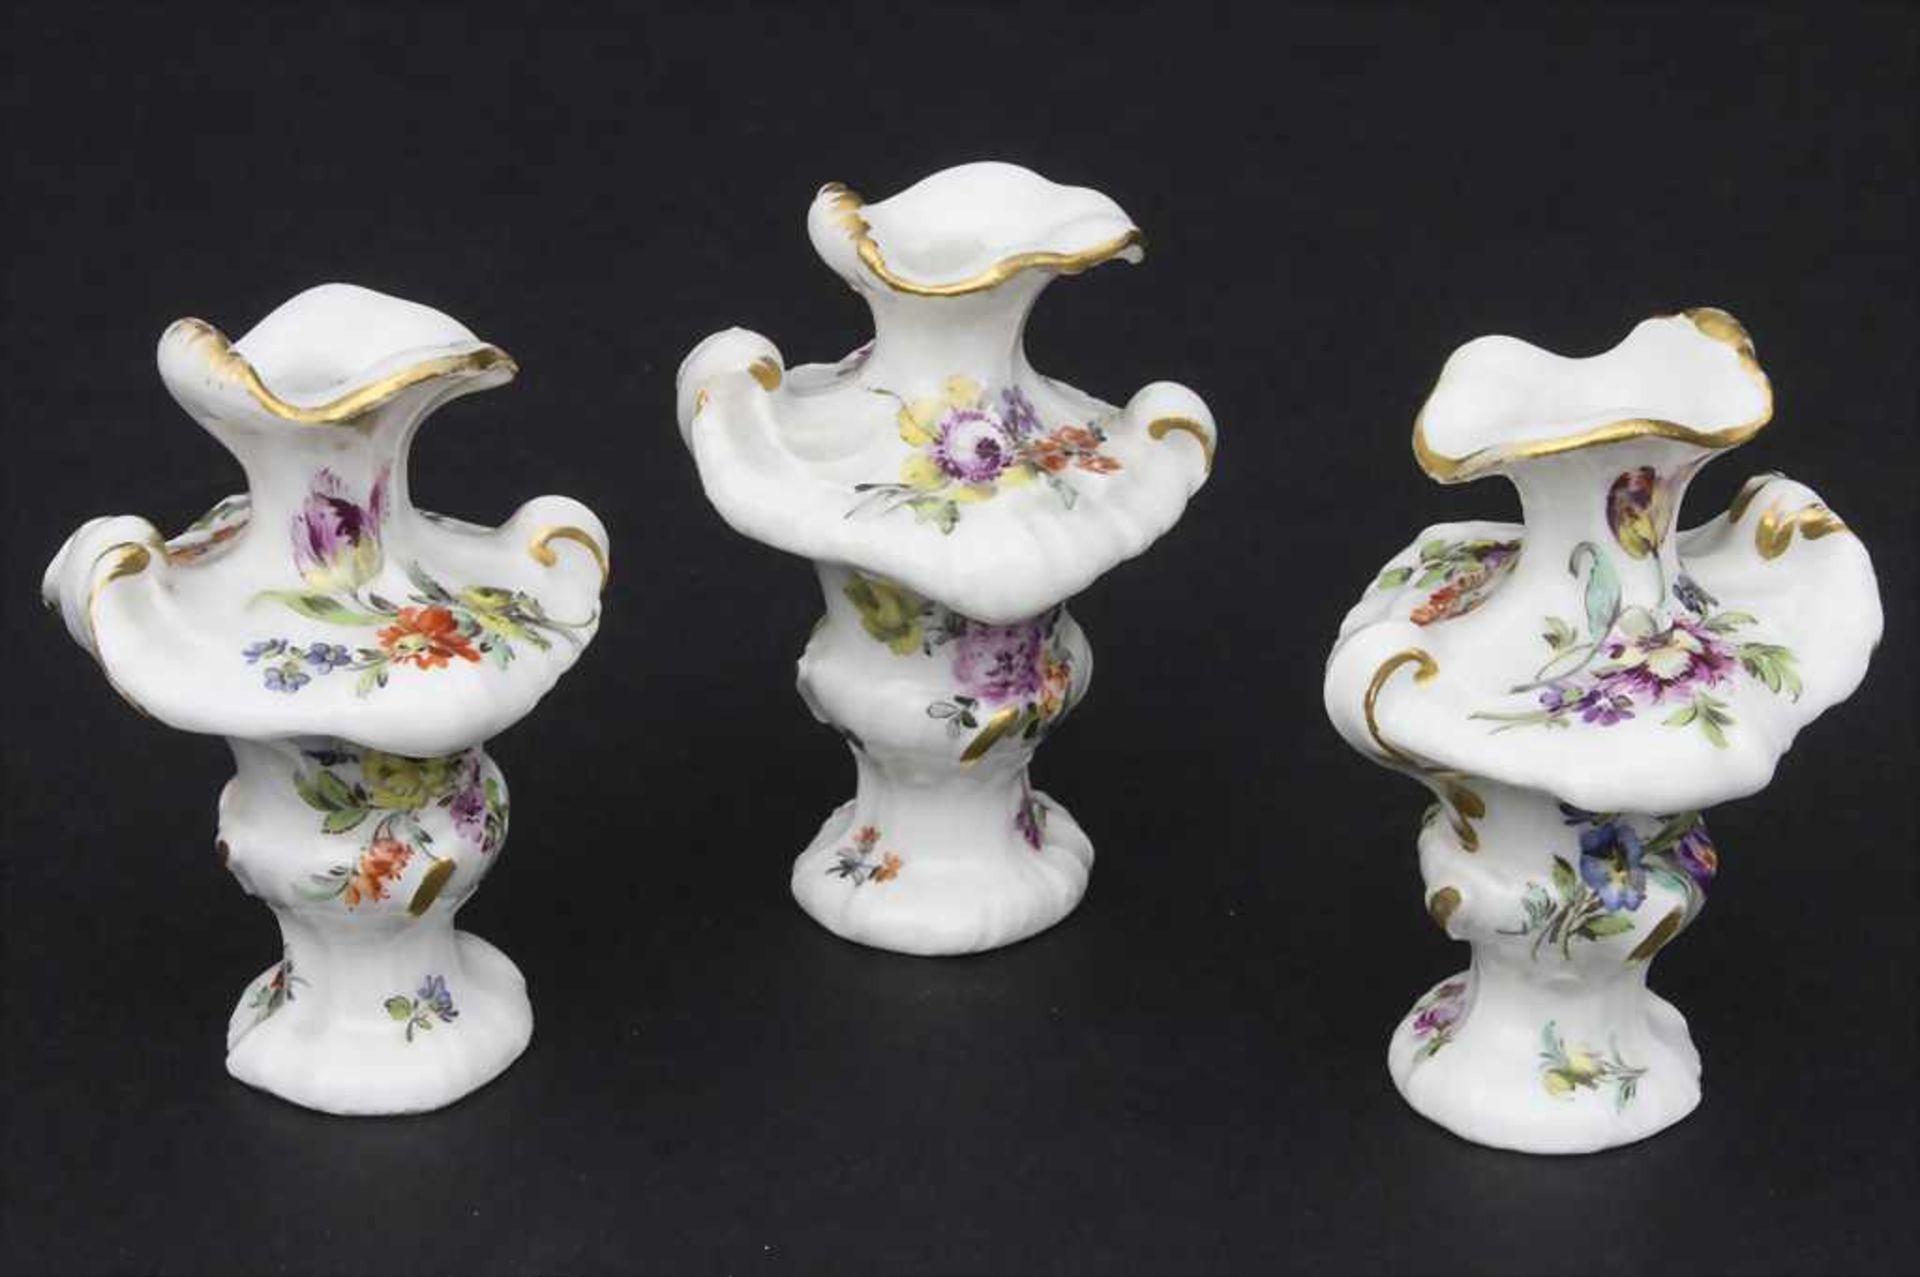 3 frühe Miniatur Vasen mit Rocaillen / A set of 3 early miniature vases with rocailles, Meissen, - Bild 2 aus 14